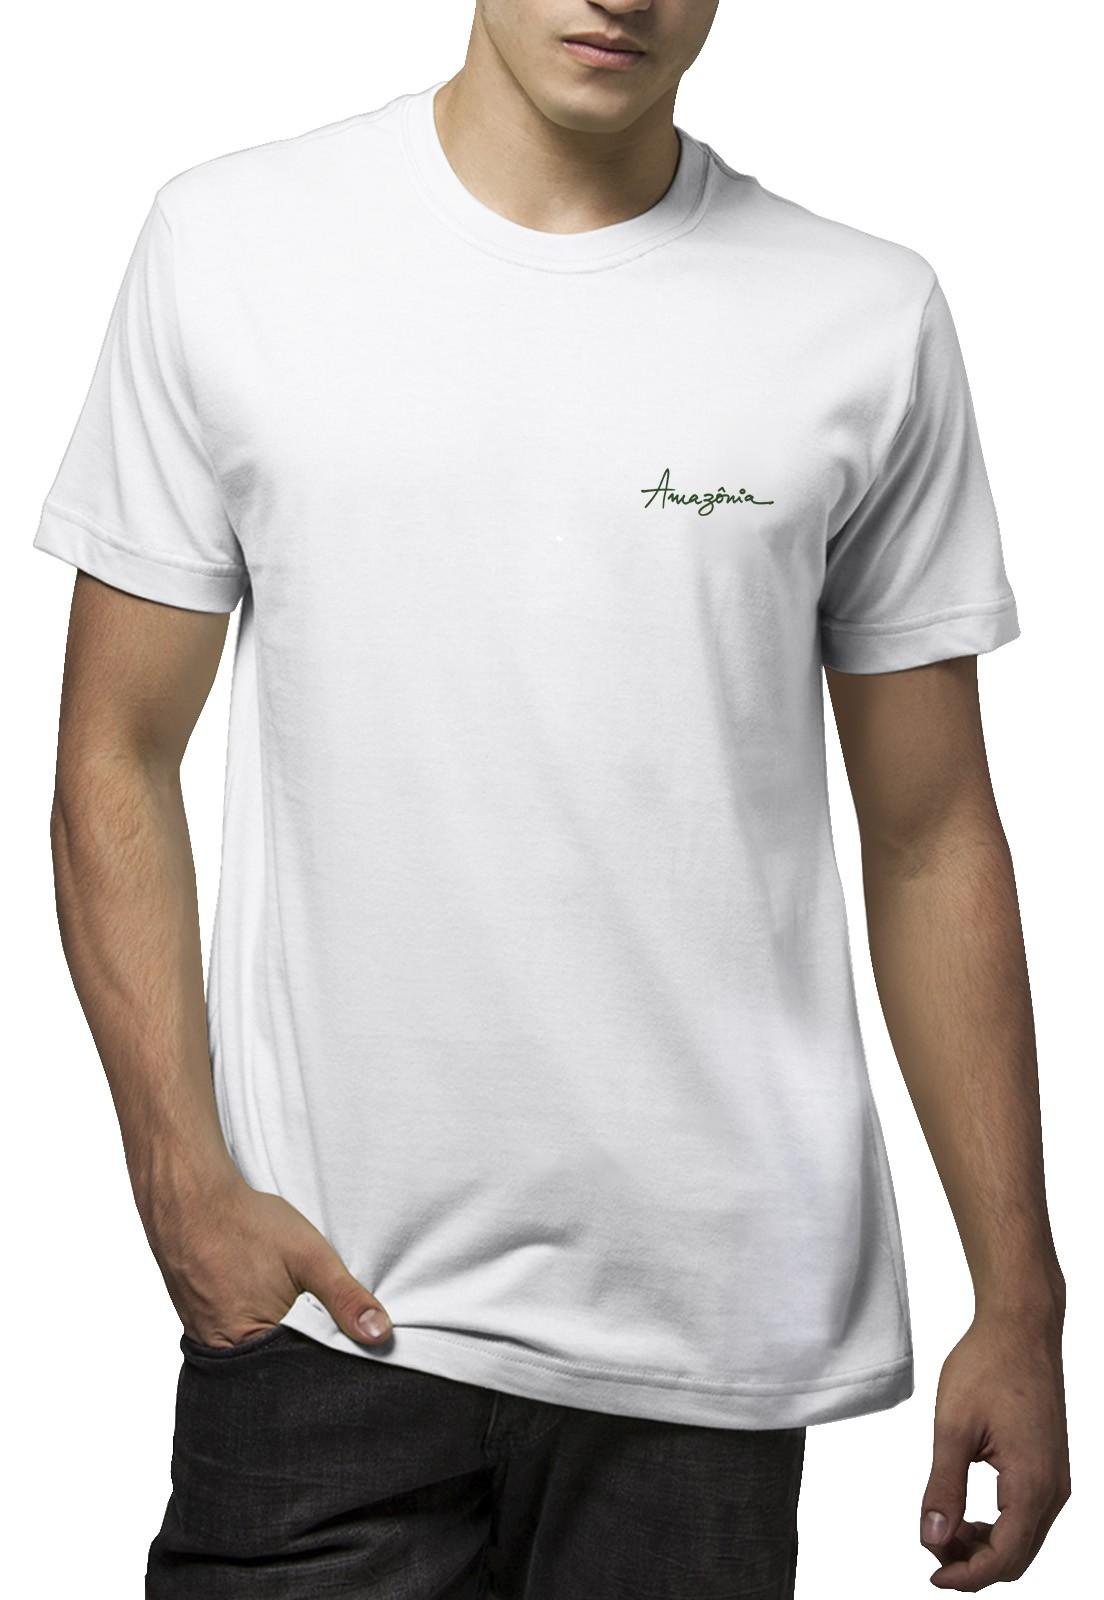 Camiseta Amazônia Lotus Gráfica - Branco